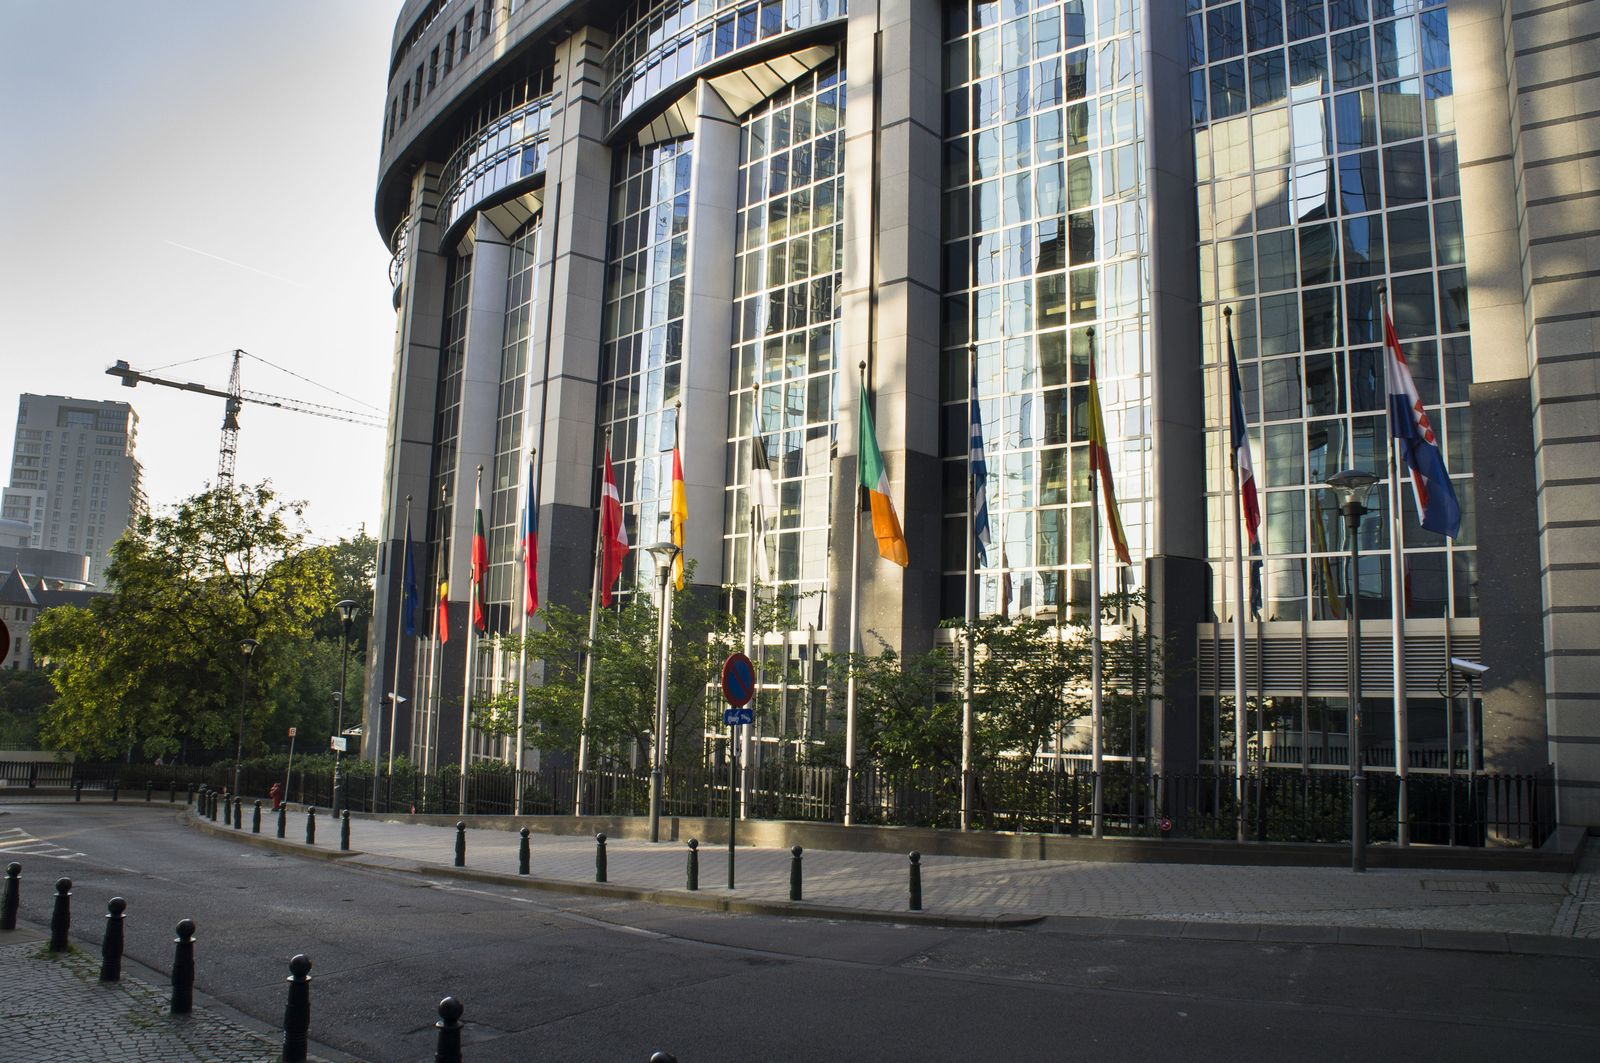 Symboldbild SEO/ EU-Parlament Brüssel/ Außen